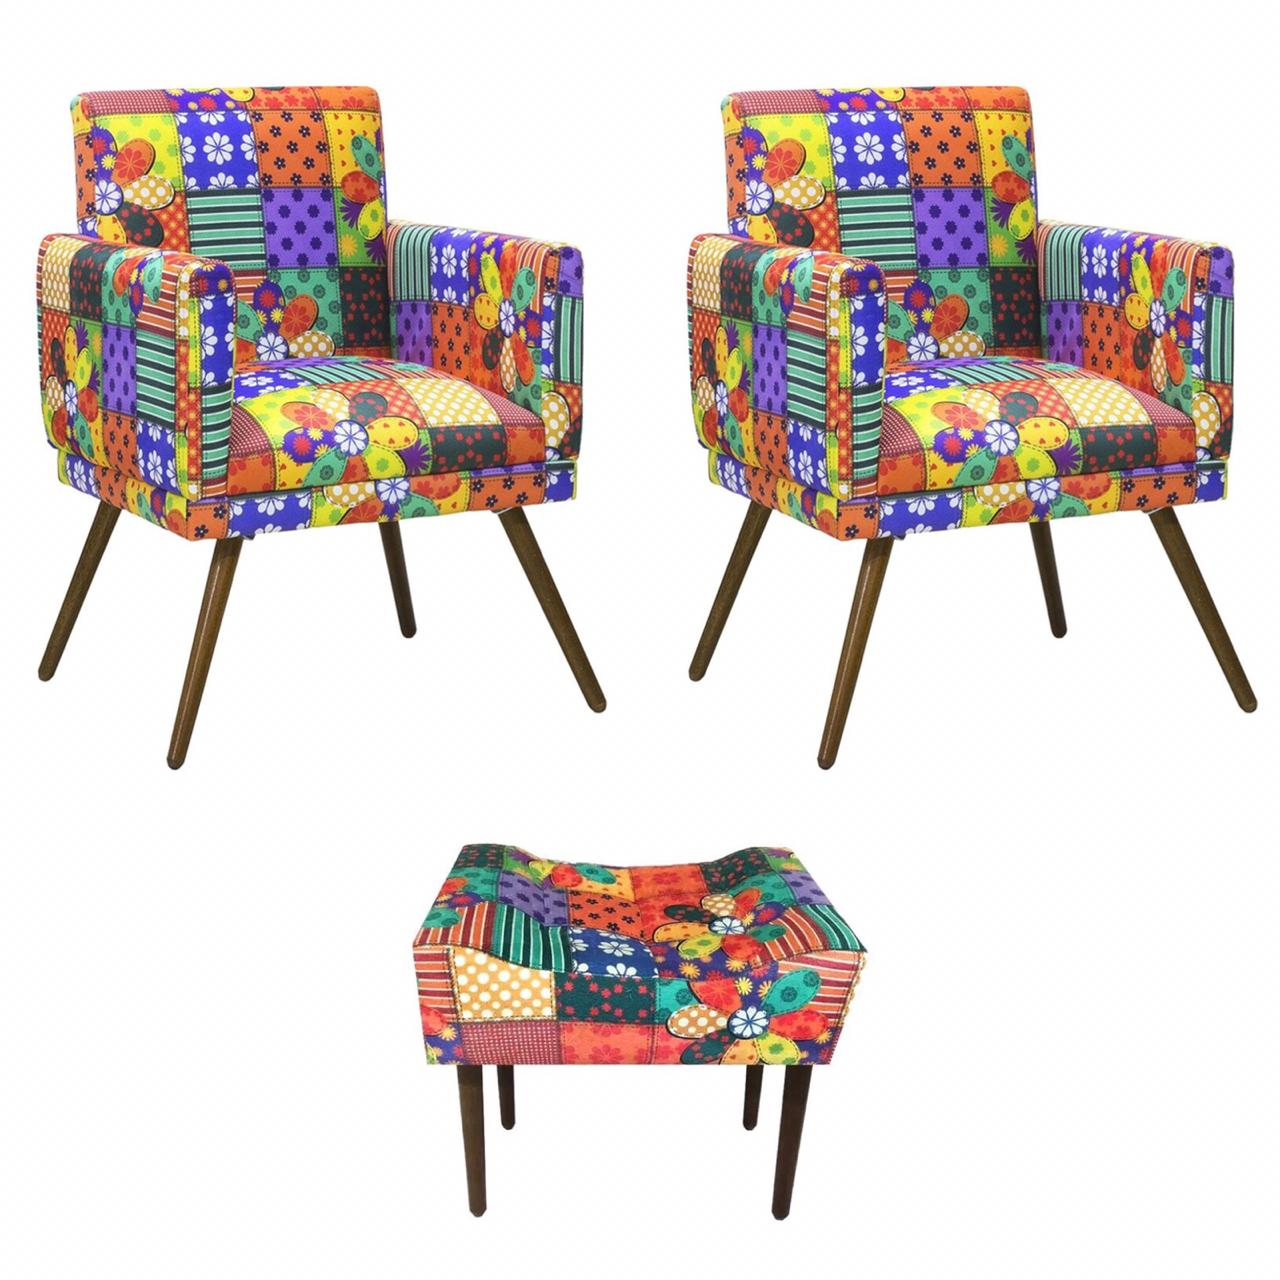 Kit 02 Poltrona Decorativa Nina com rodapé e Puff retangular Patchwork - Bela Casa Shop